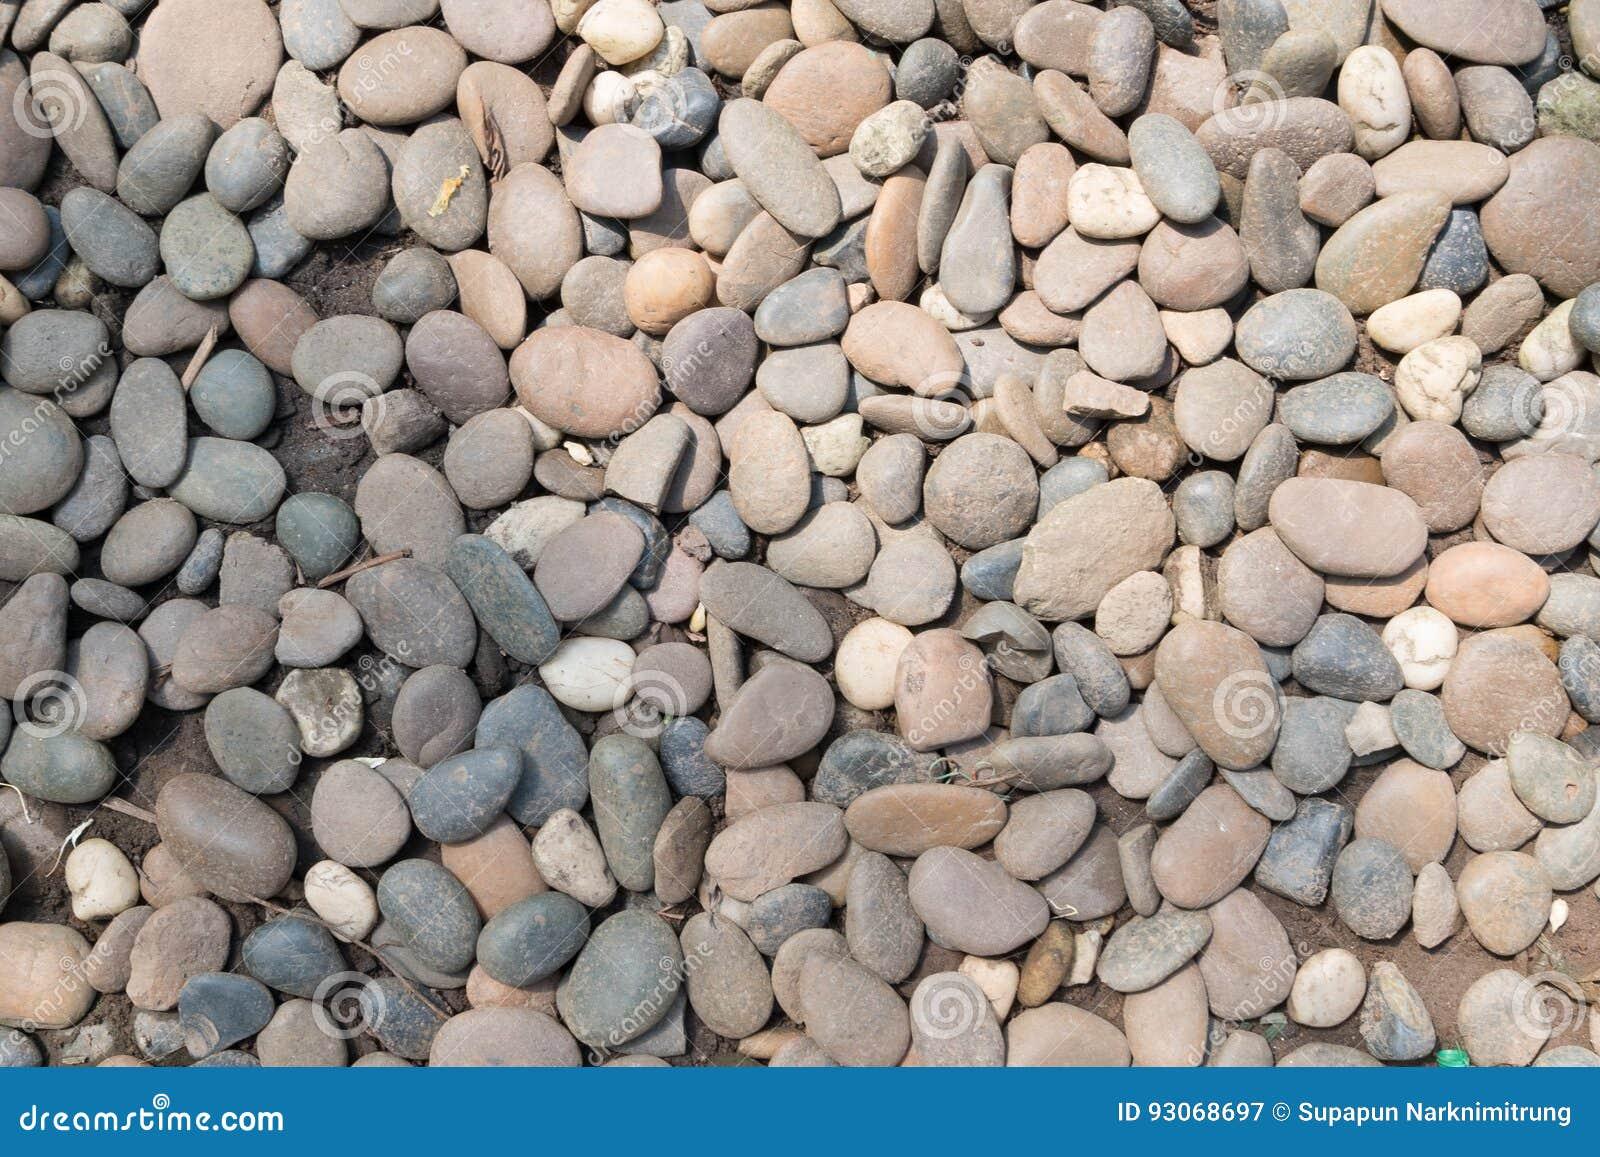 Decorative stone pebble background round gravel texture for Piedra decorativa para jardin